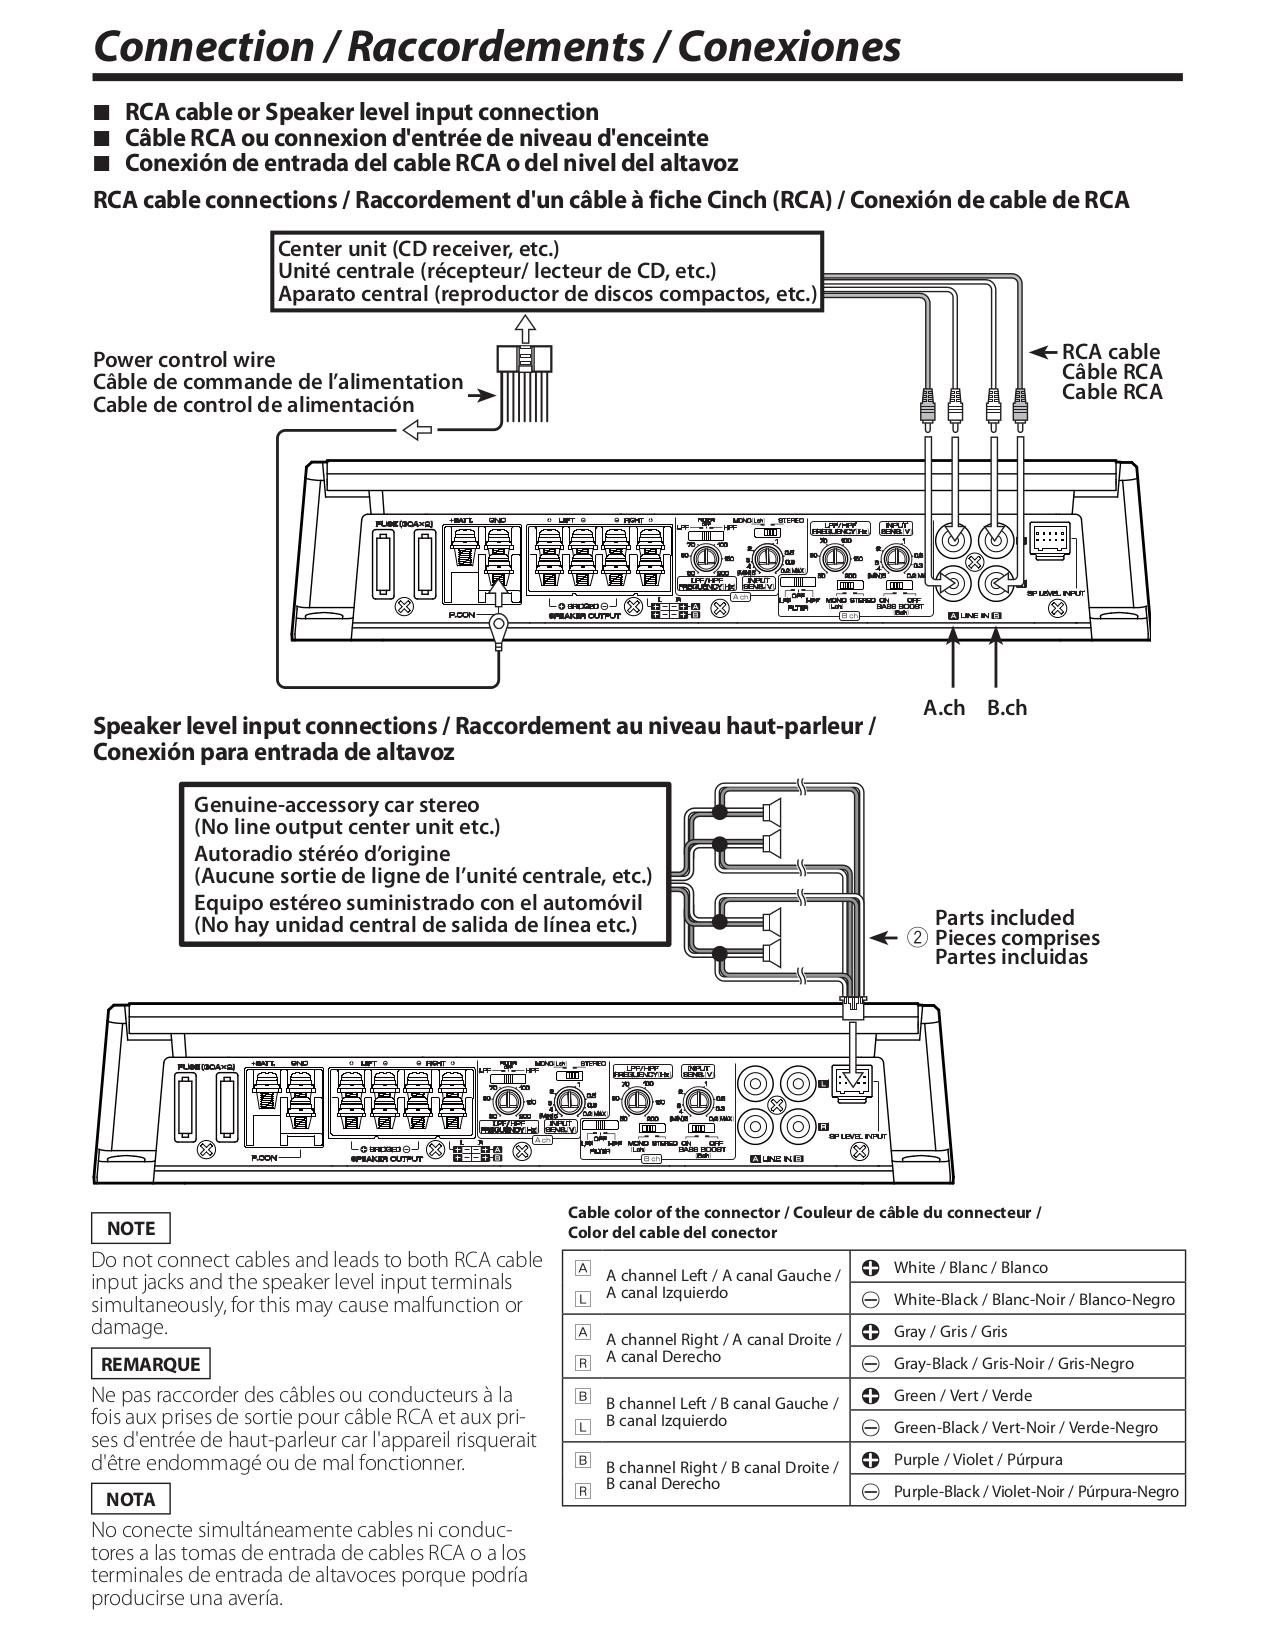 Kenwood Ddx 371 Car Stereo Wiring Harness Diagram Kenwood Original Wire Harness Ddx271 Ddx371 Ebay Kenwood Ddx 6019 Kvt 512 Kvt 514 Kvt 516 Wiring Harness Excellent Wiring Harness Diagram For Kenwood